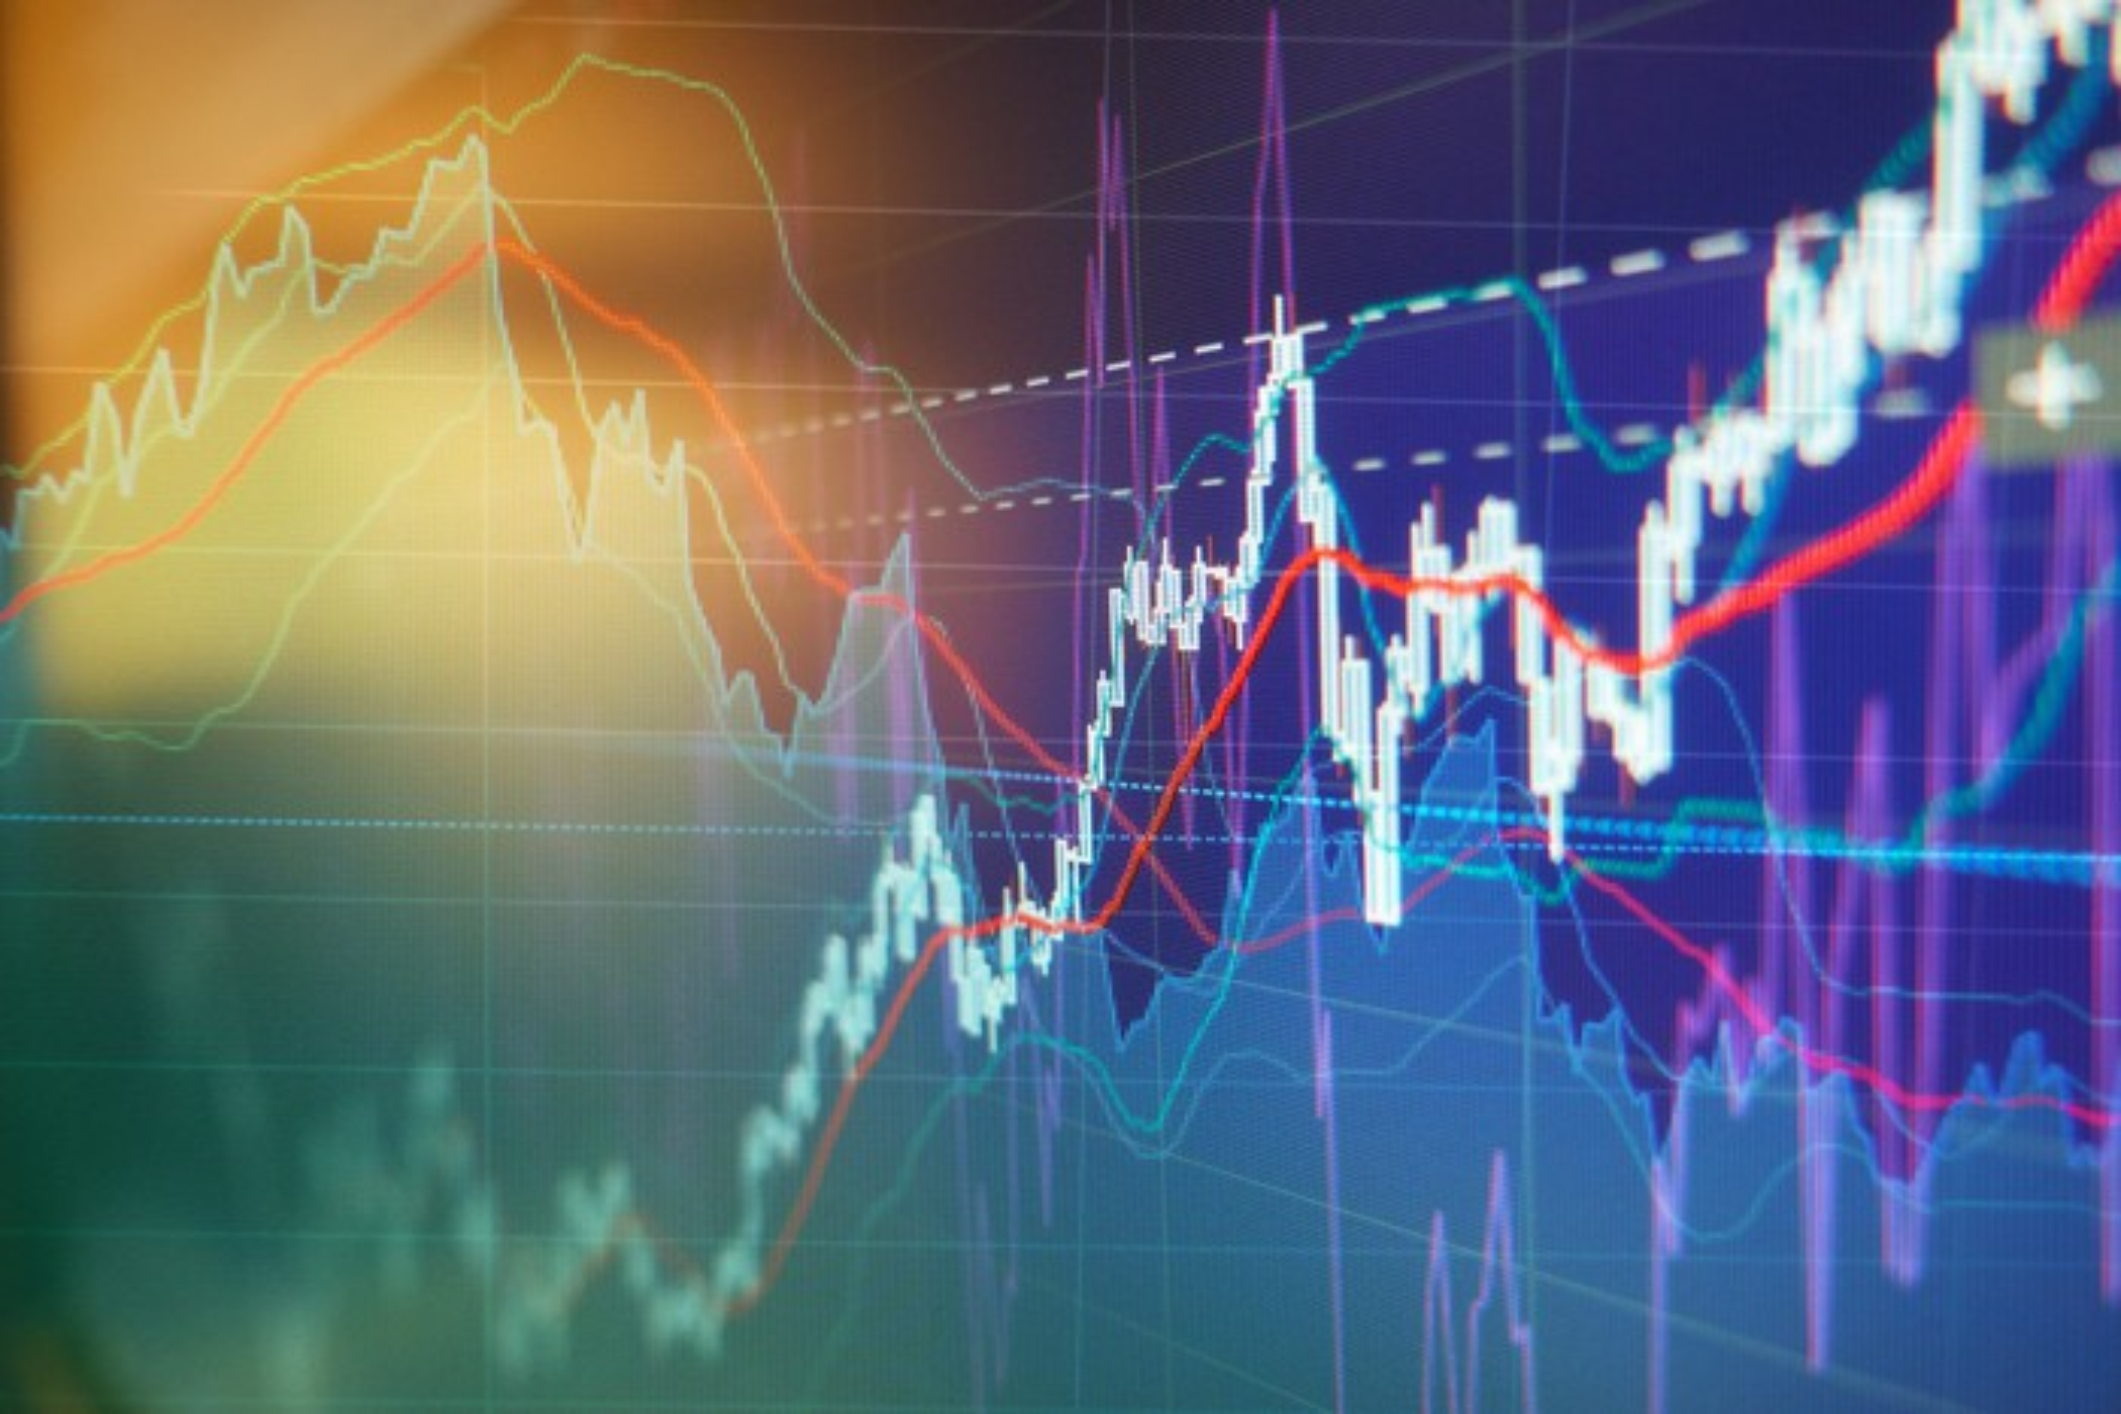 Image of stock chart.